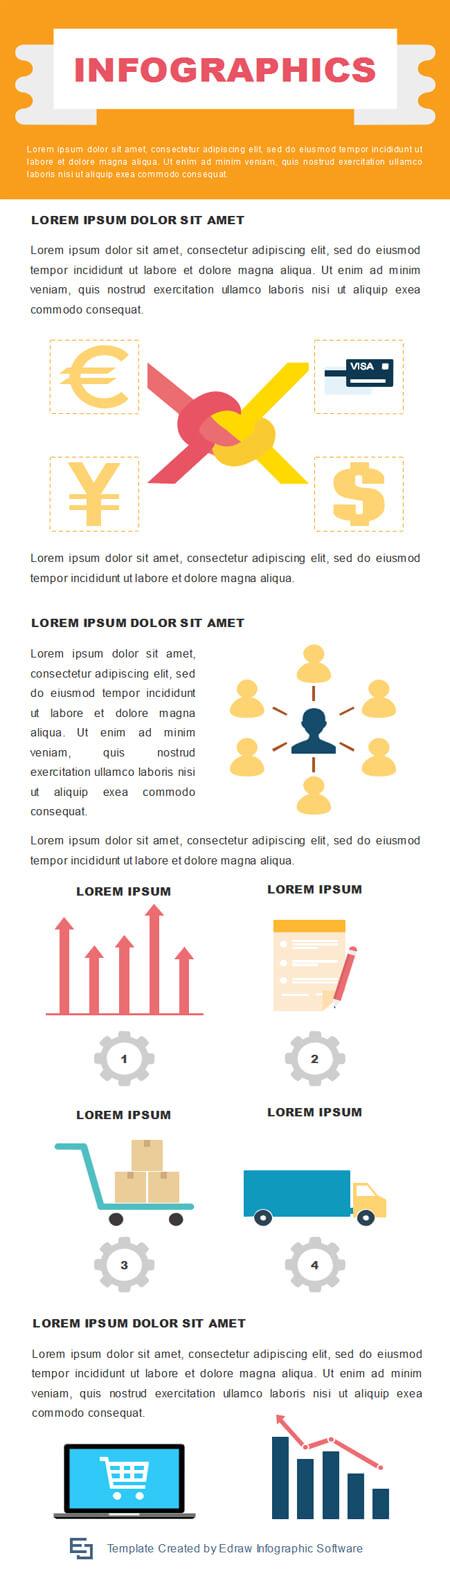 plantilla de infografía completa gratuita work-process-infographic